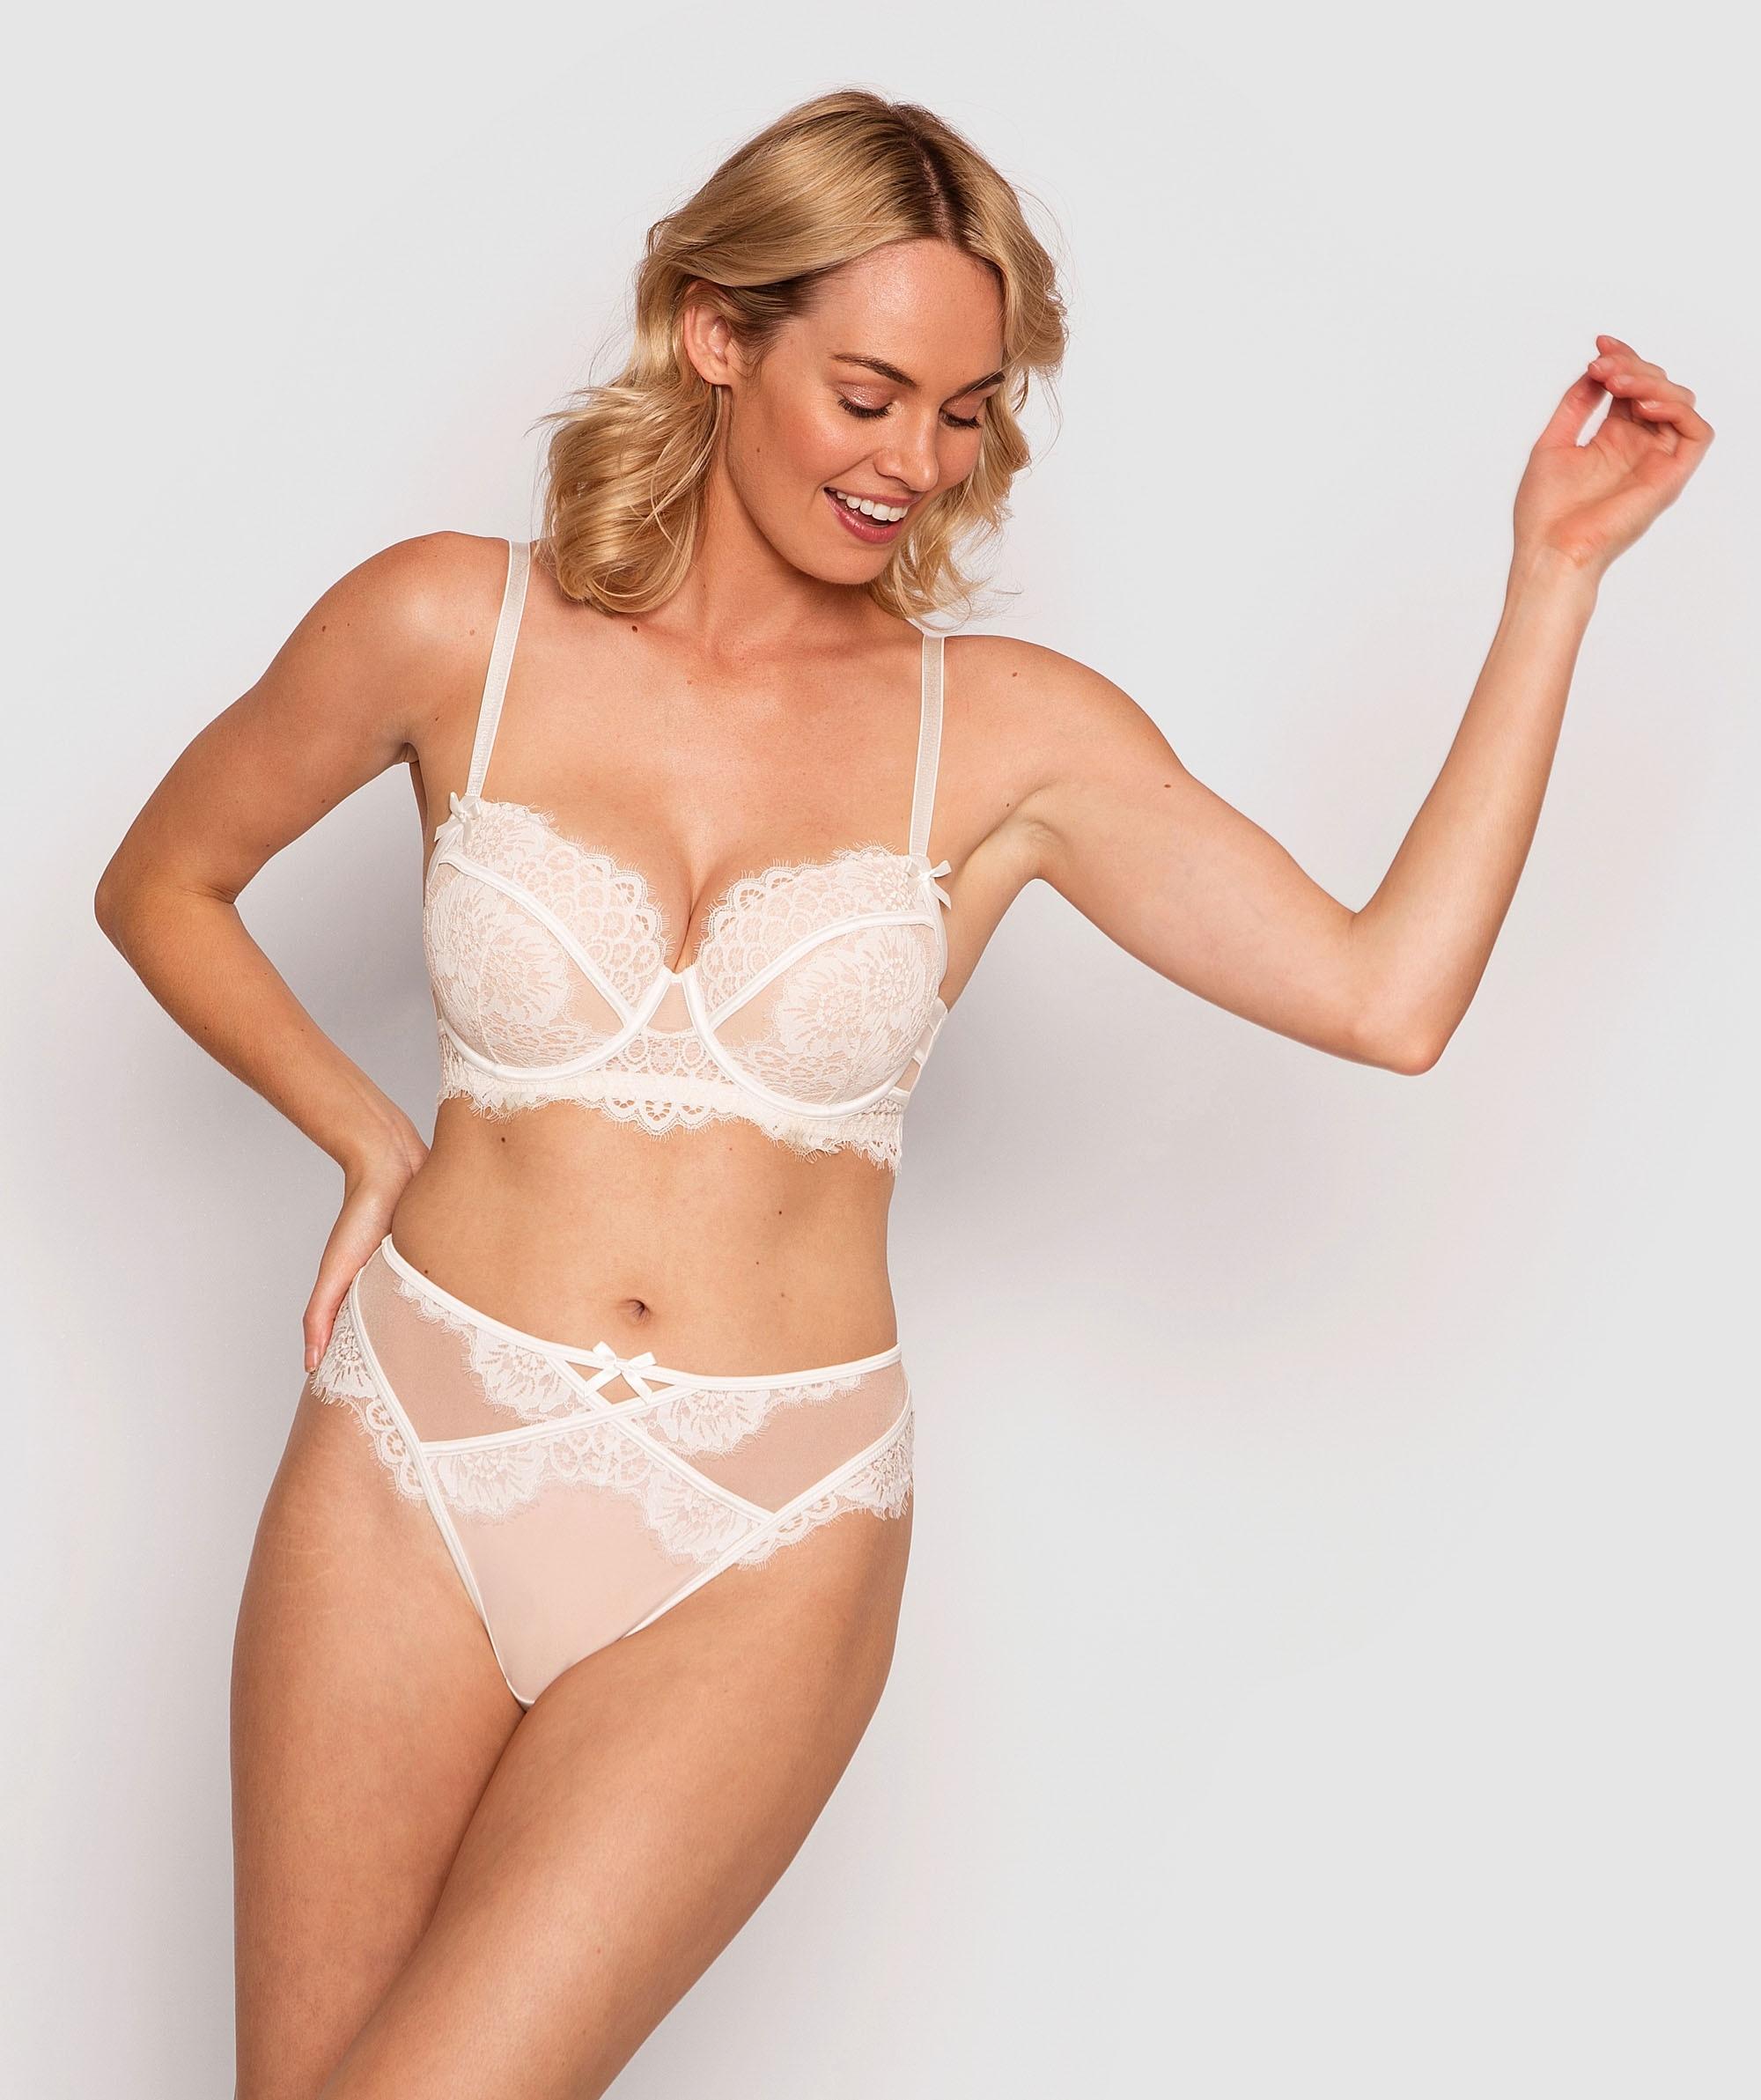 Indulge Me High Waist V String Knicker - Ivory/Nude